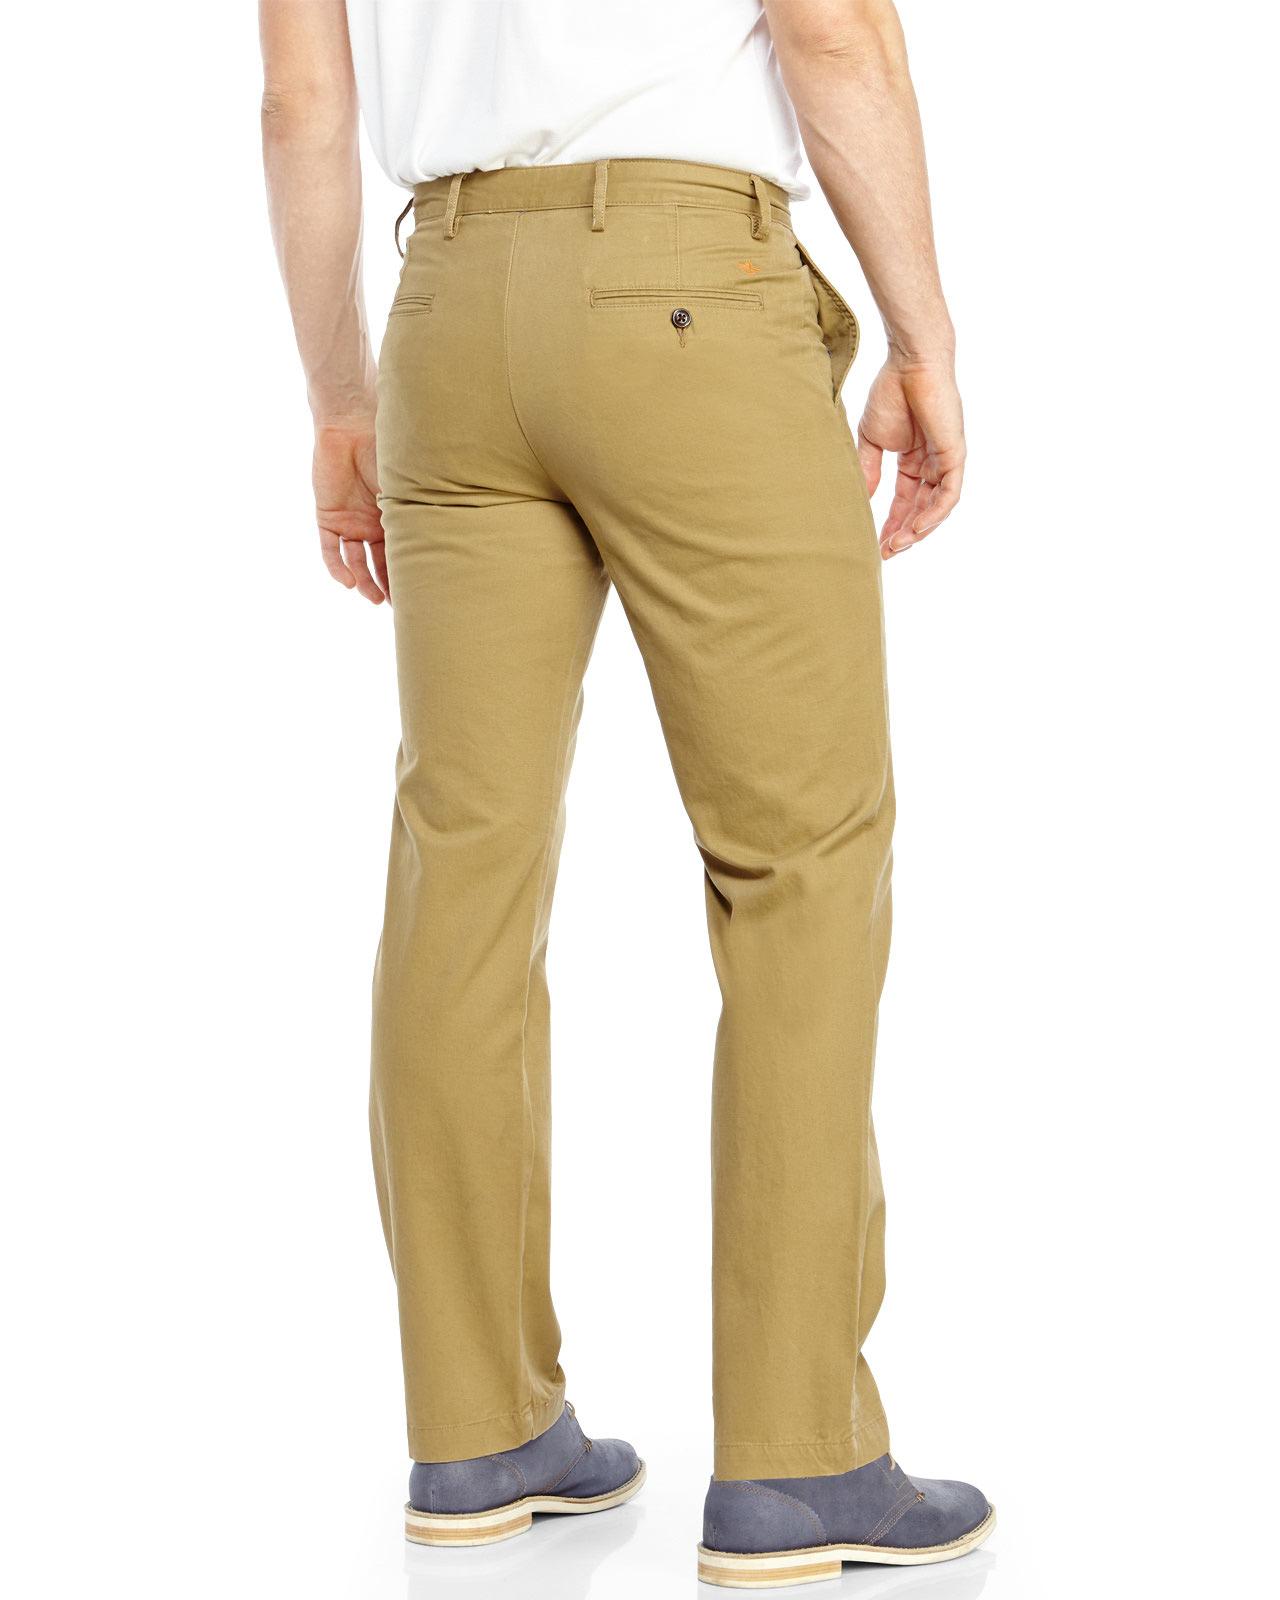 Khaki Slim Fit Pants